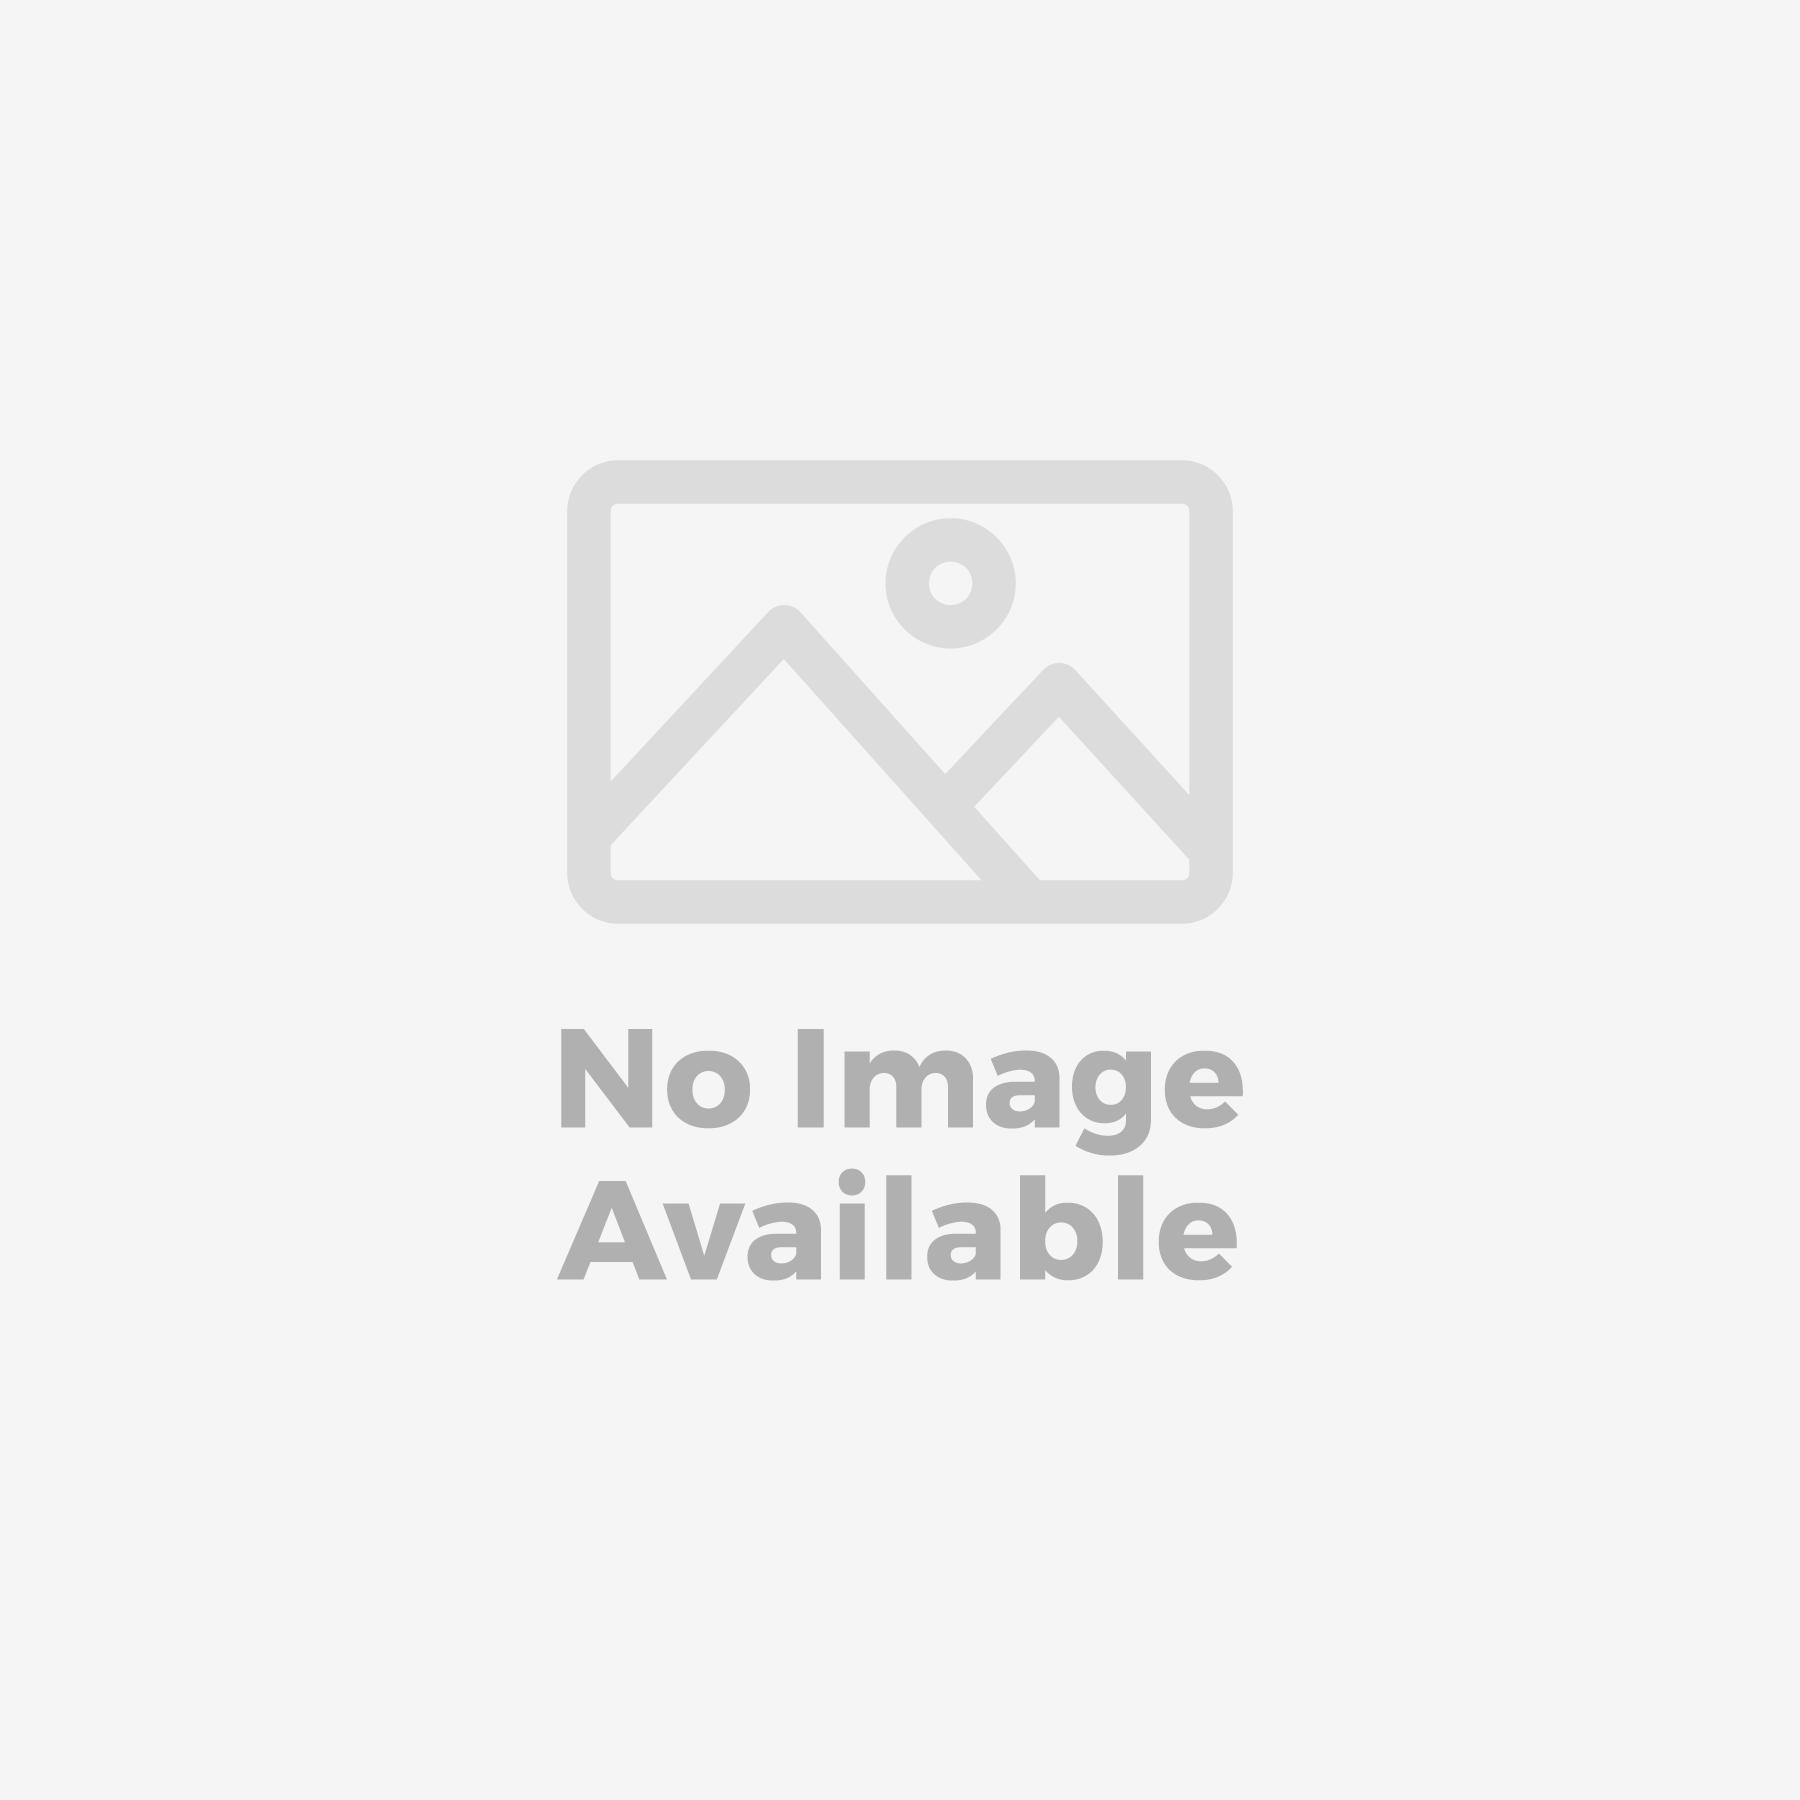 VENUS - Sculpture on a metal stand